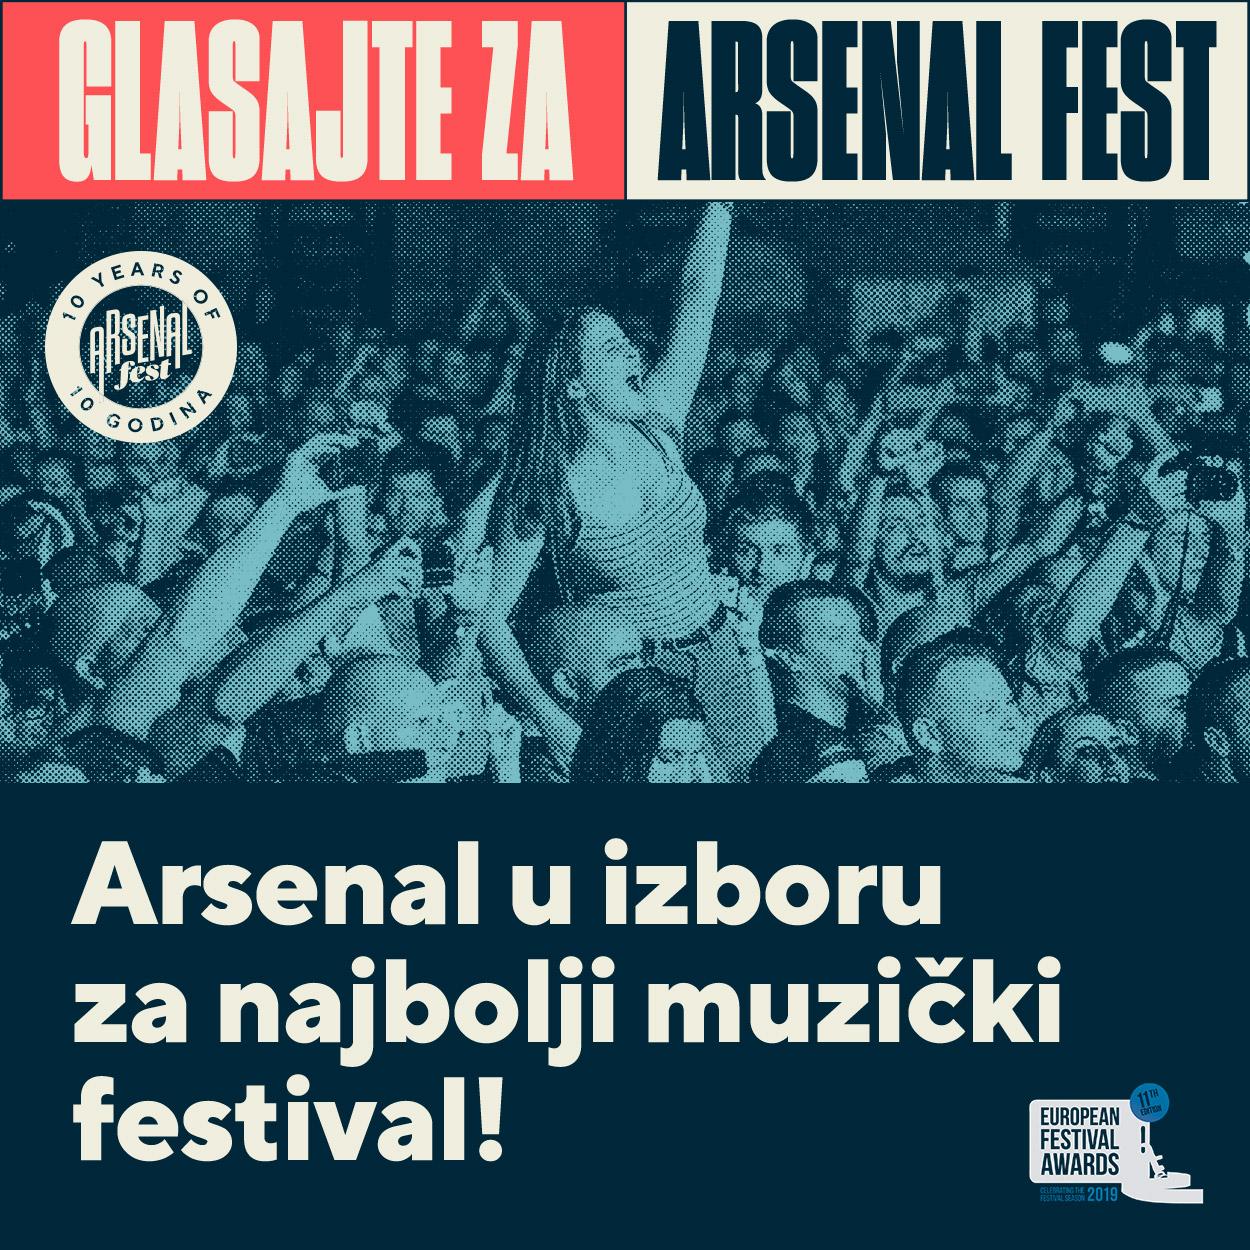 Arsenal u konkurenciji za European Festival Awards!